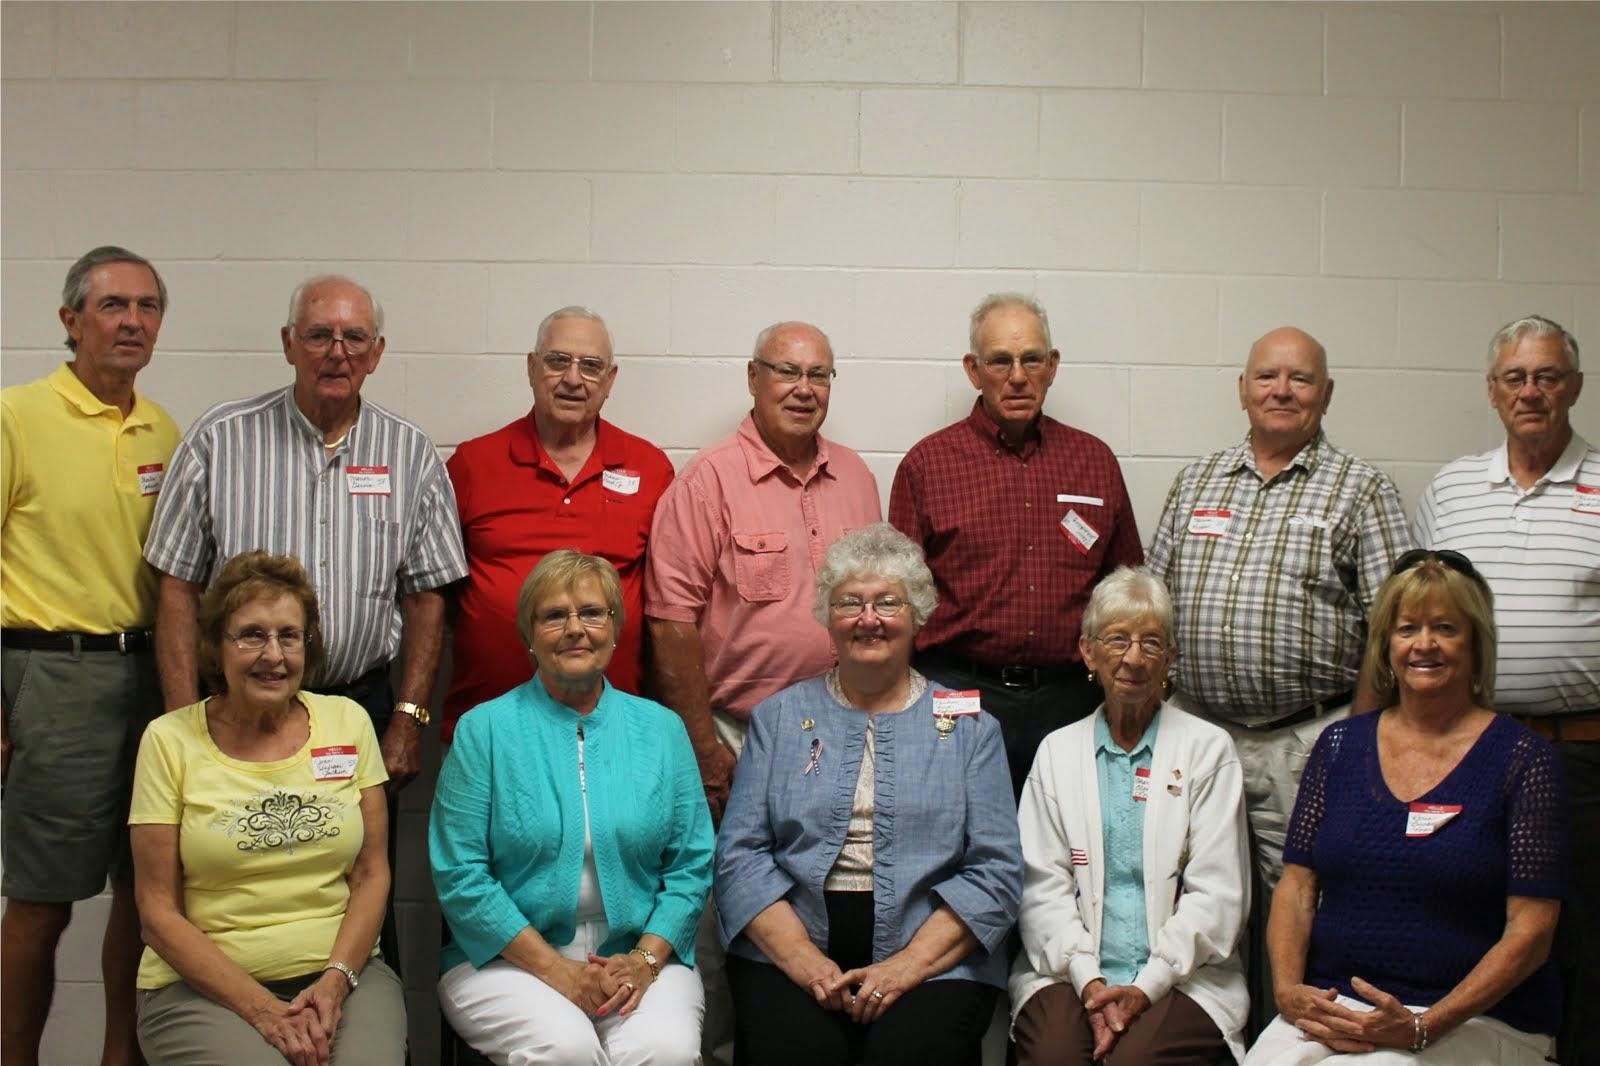 2013    Class of 1958